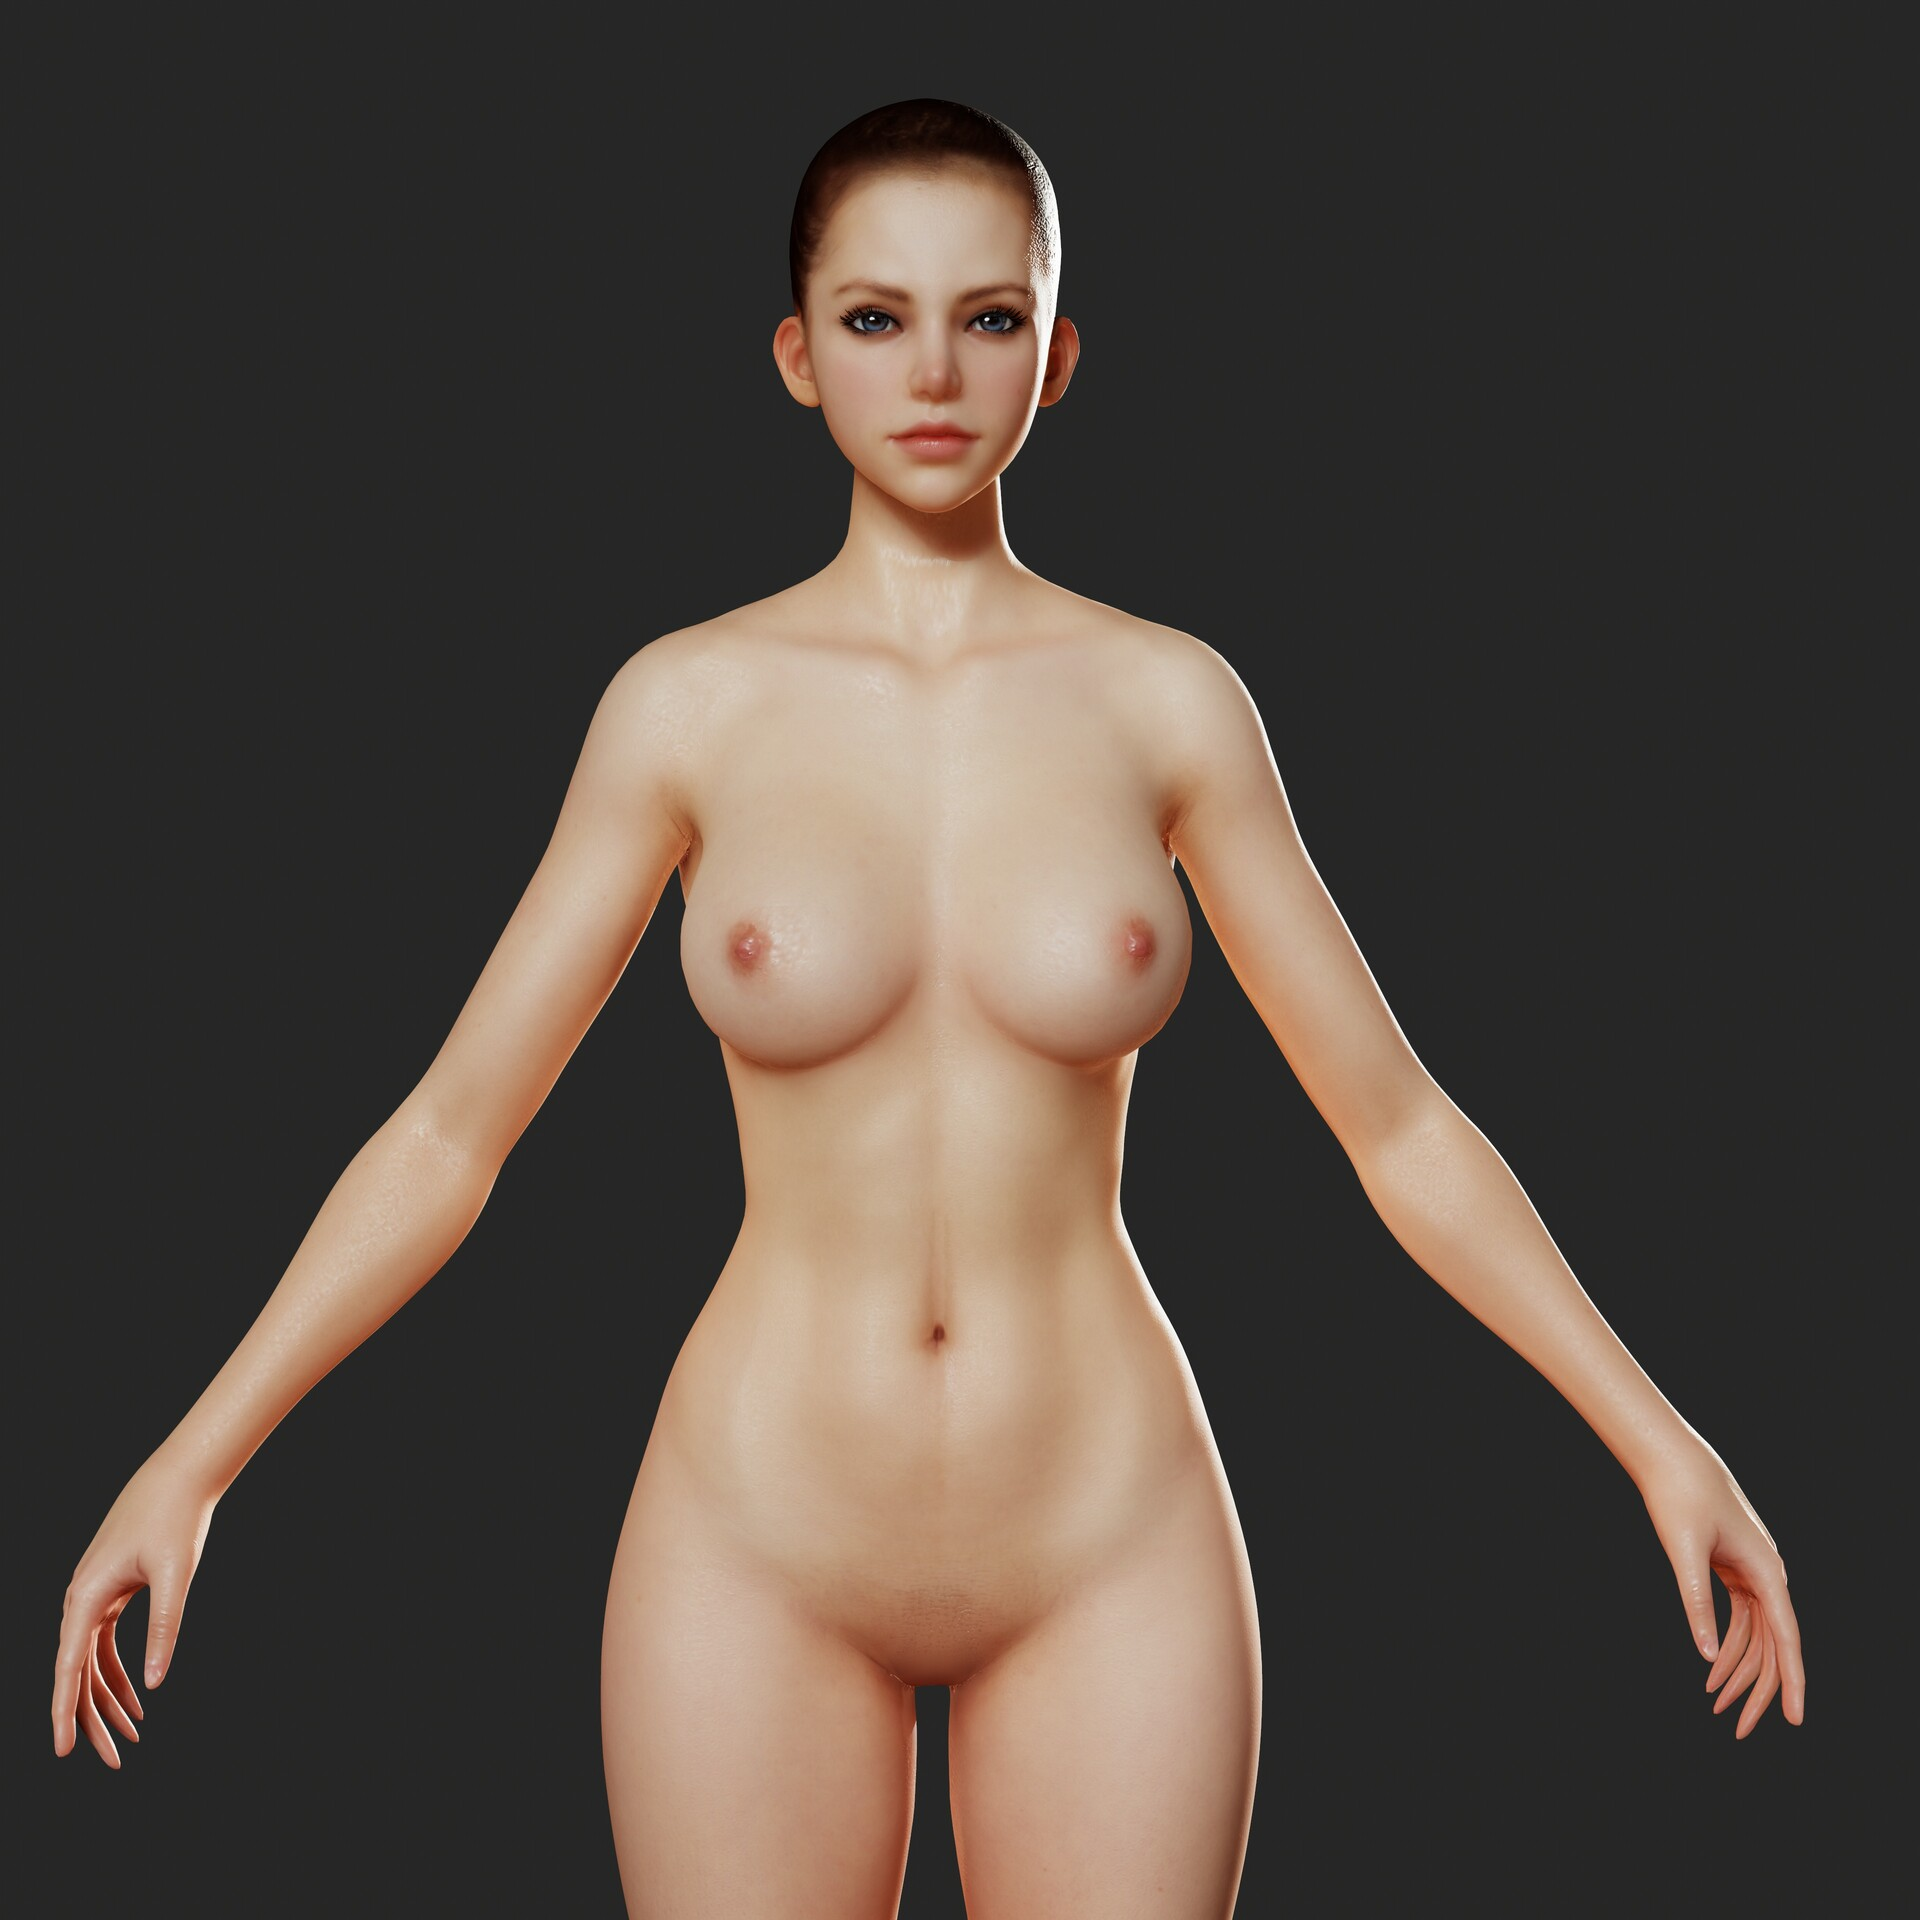 Female Picture Nude